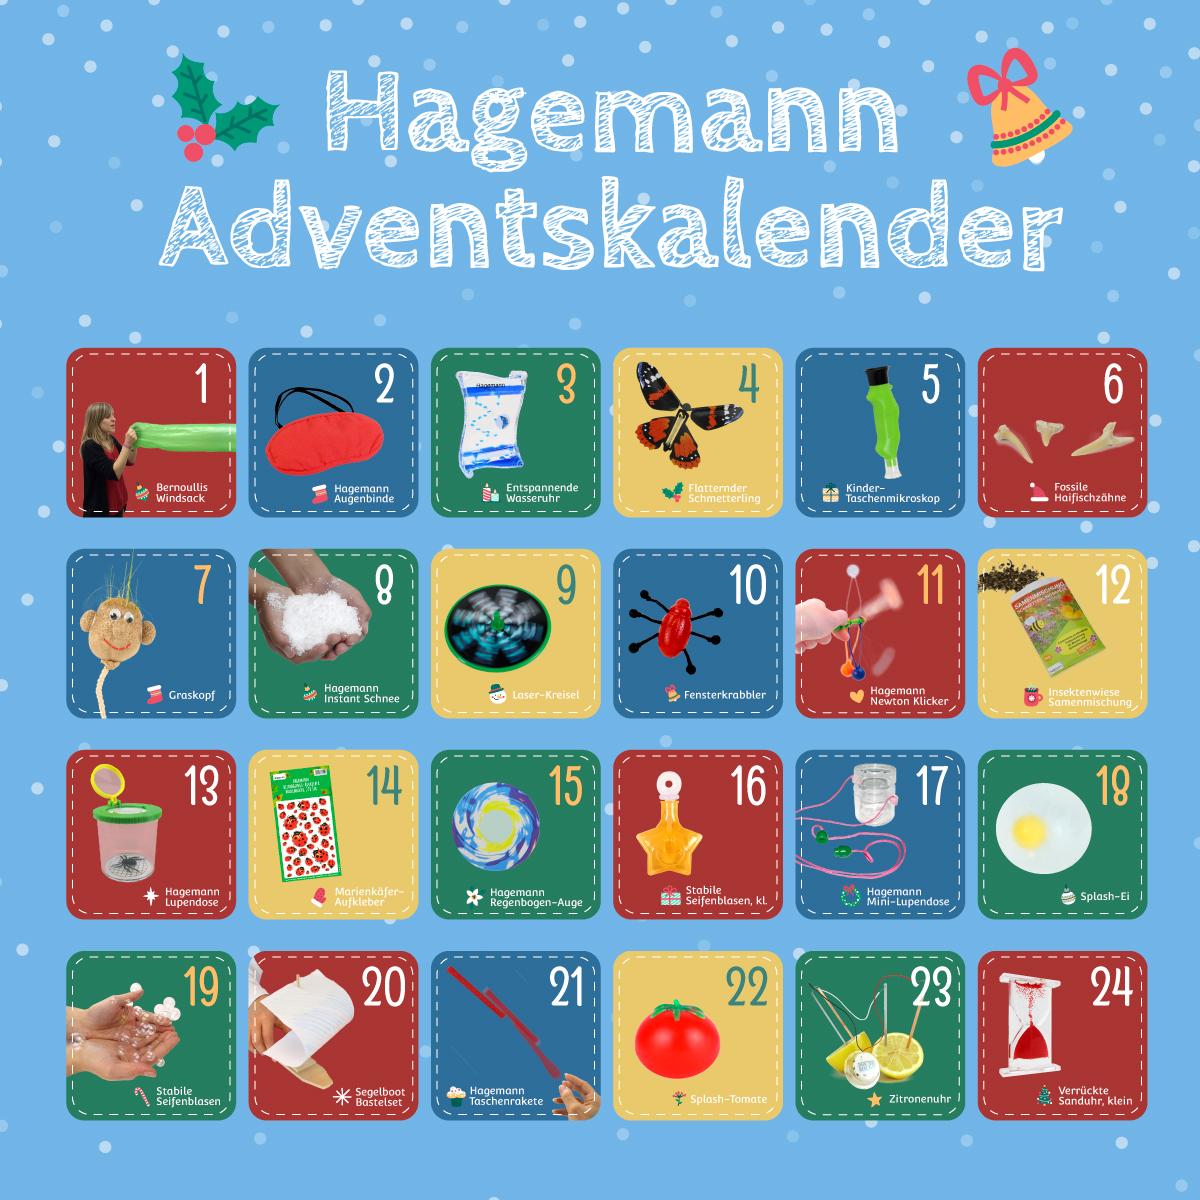 Inhalt Hagemann Adventskalender 2020